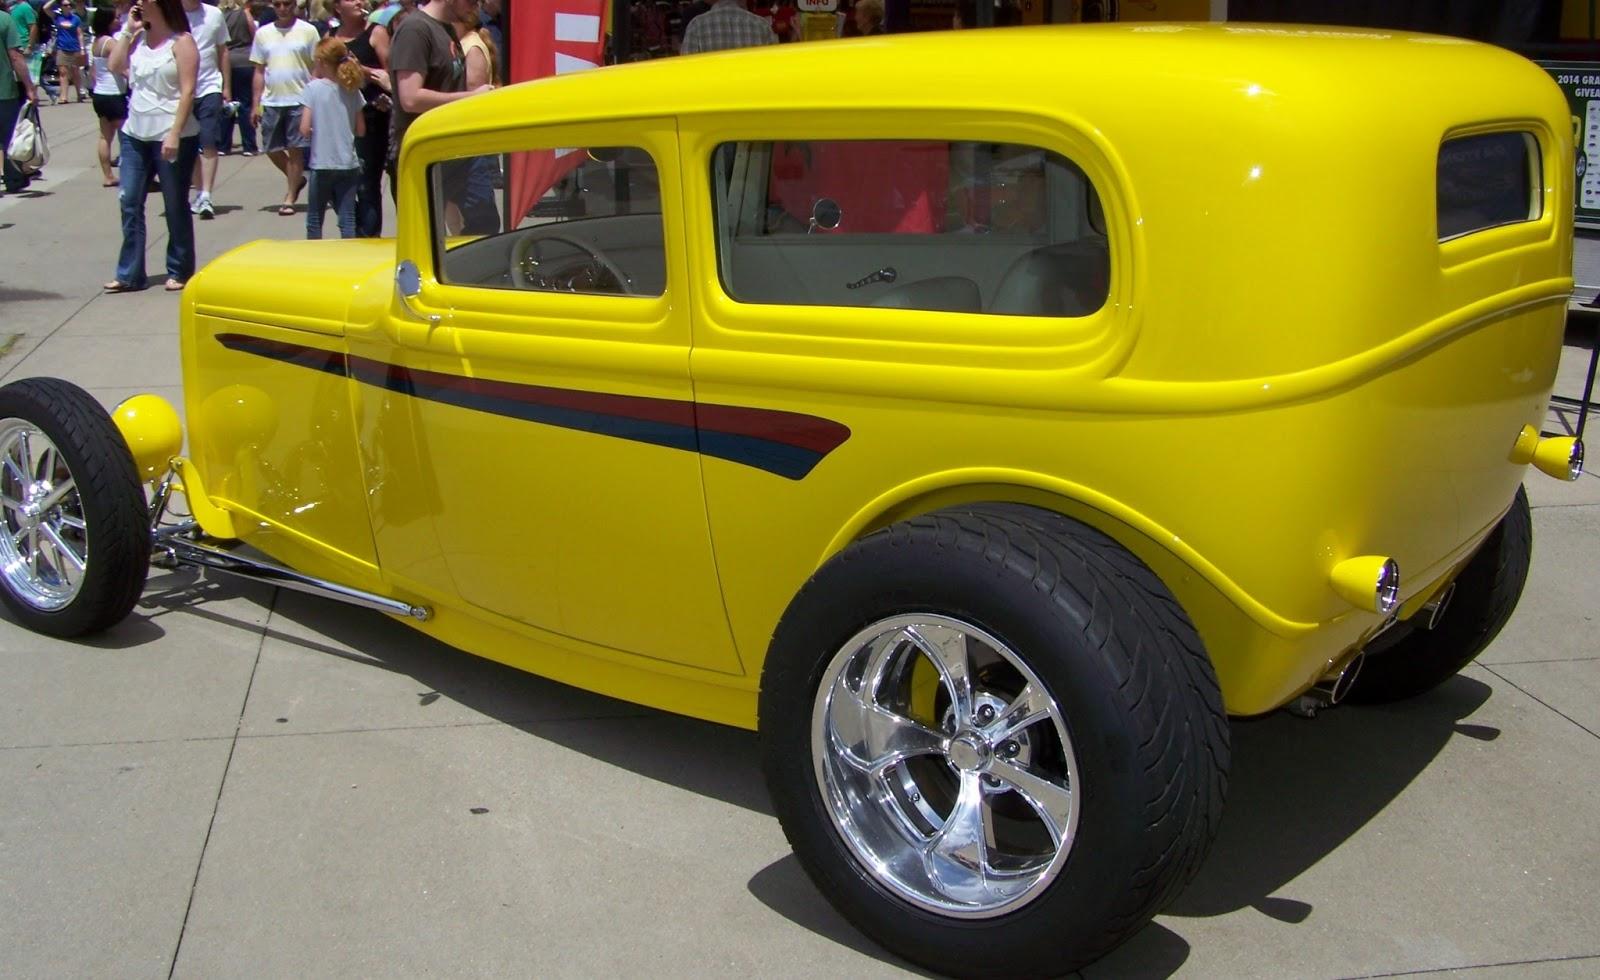 All About Cars Goodguys Rod Custom Association Give Away Car - Good guys car show nashville